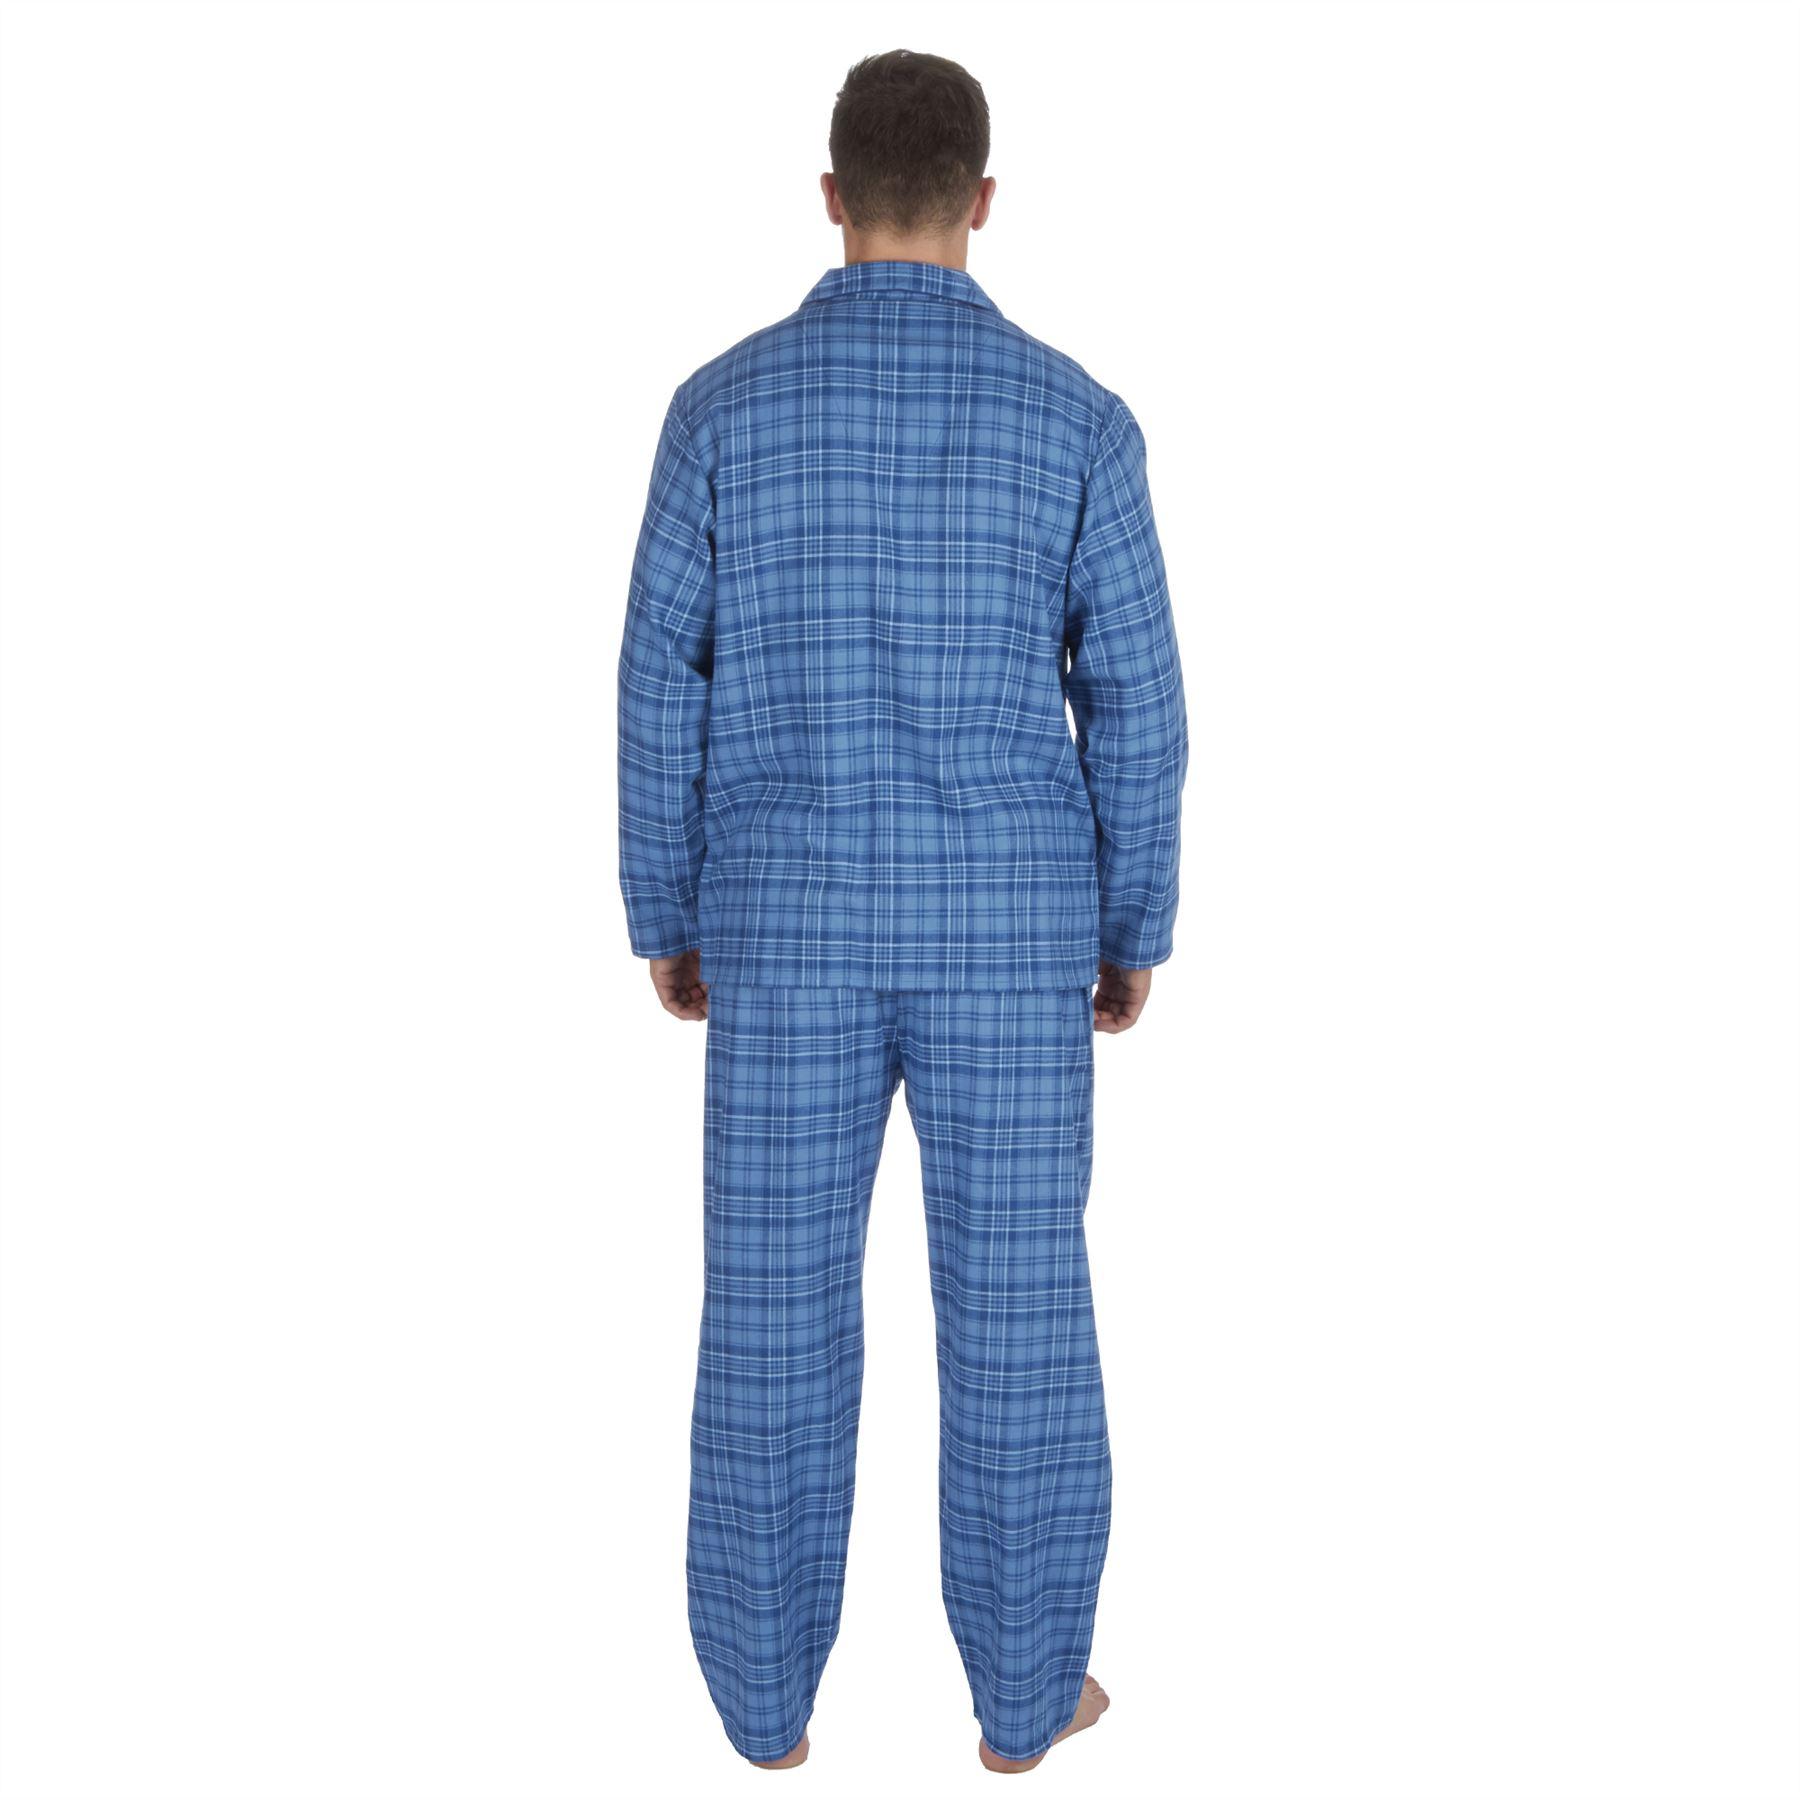 thumbnail 3 - Mens-Boys-100-Cotton-Flannel-Long-Sleeved-Pyjamas-Pyjama-Set-Check-Size-M-XXL